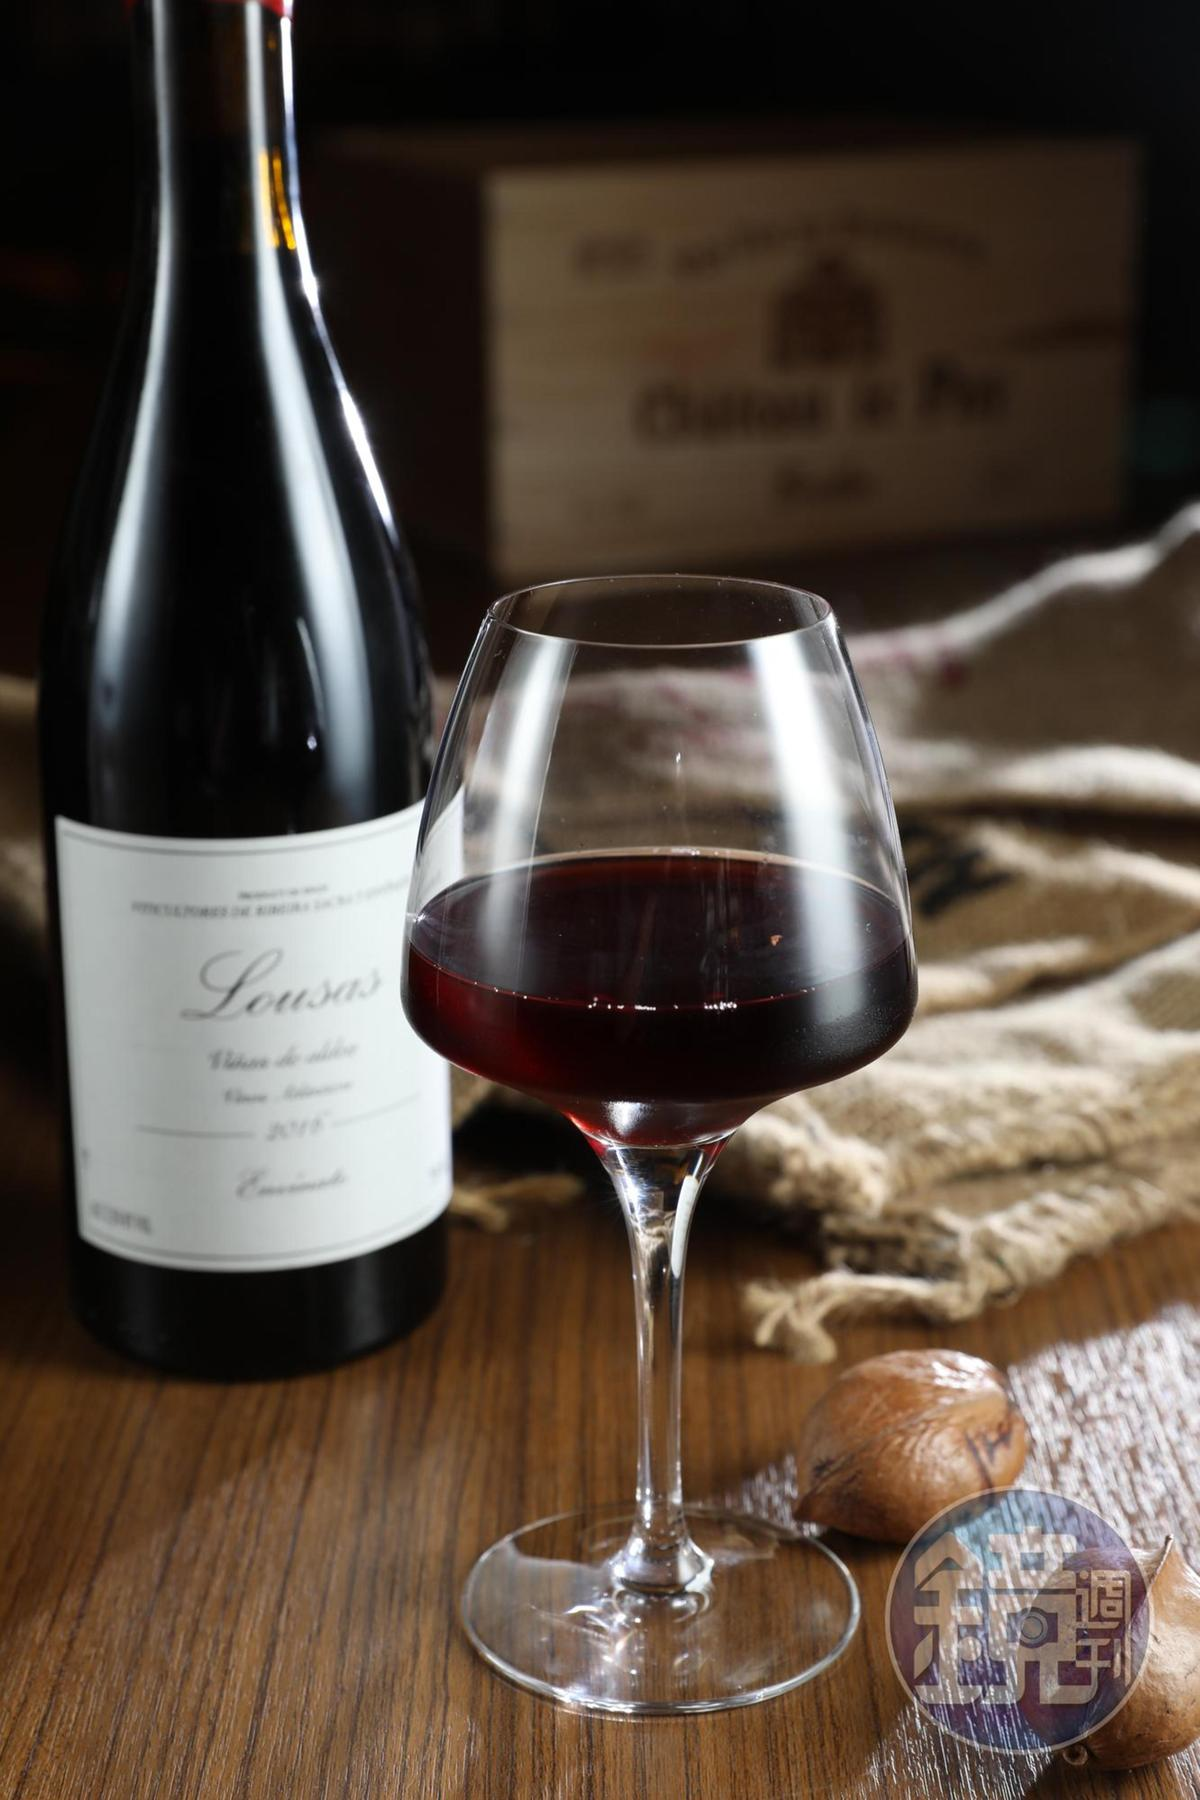 混釀Merenzao、Caino、GarnachaTintorerra等西班牙西北部當地葡萄品種的「Envinate, Ribeira Sacras, Lousas Tinto, 2016」,滋味平衡優雅。( Salud,1,000元/瓶)